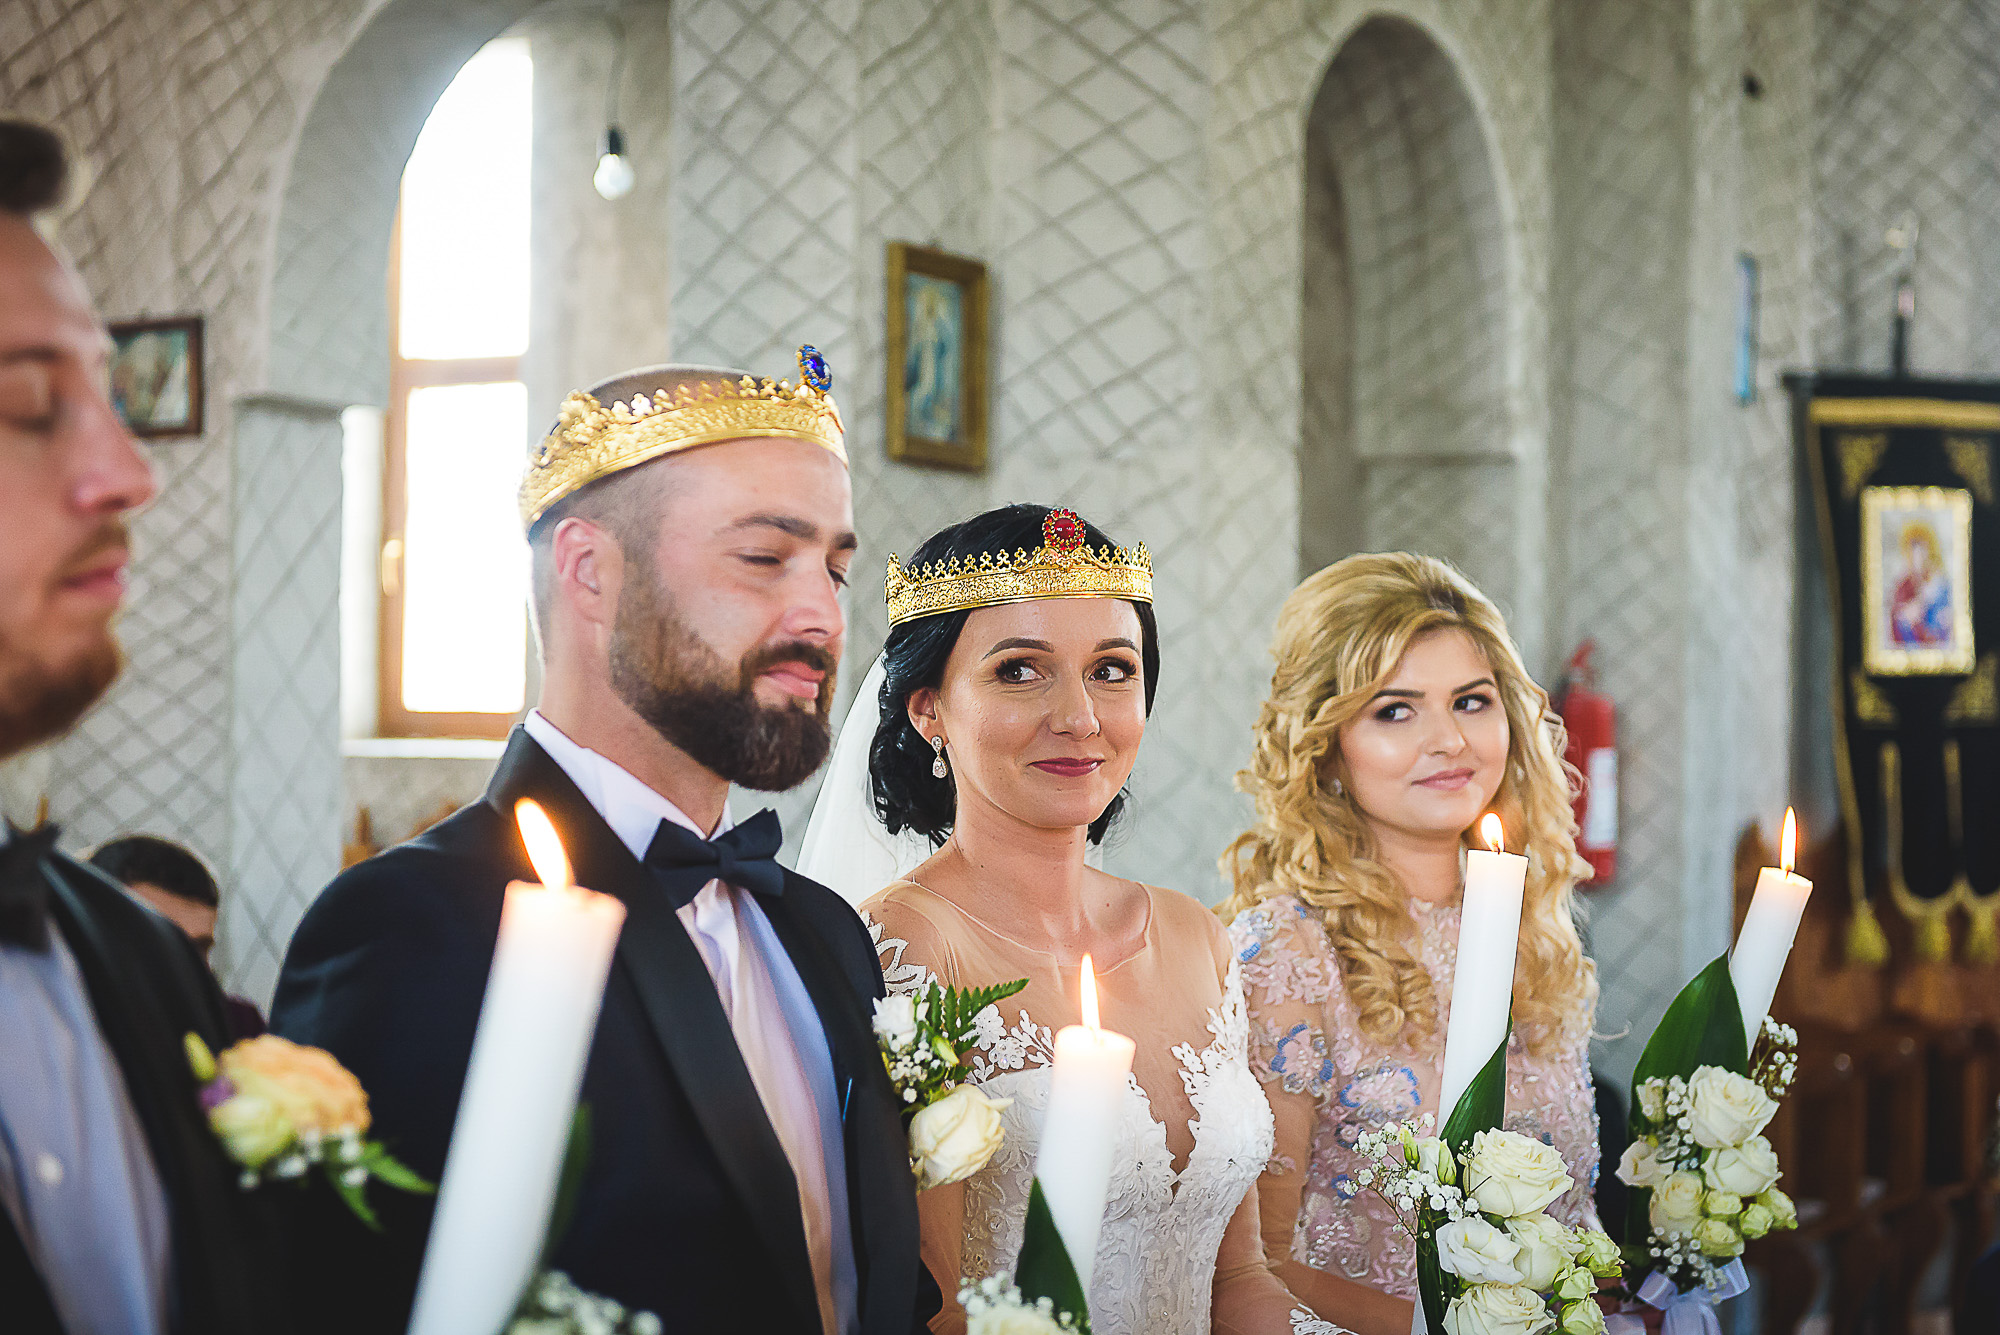 privirea miresei, cununia religioasa, biserica ortodoxa, fotografie creativa de nunta, fotograf nunta mures, foto nunta reghin, foto video reghin, foto video nunta mures